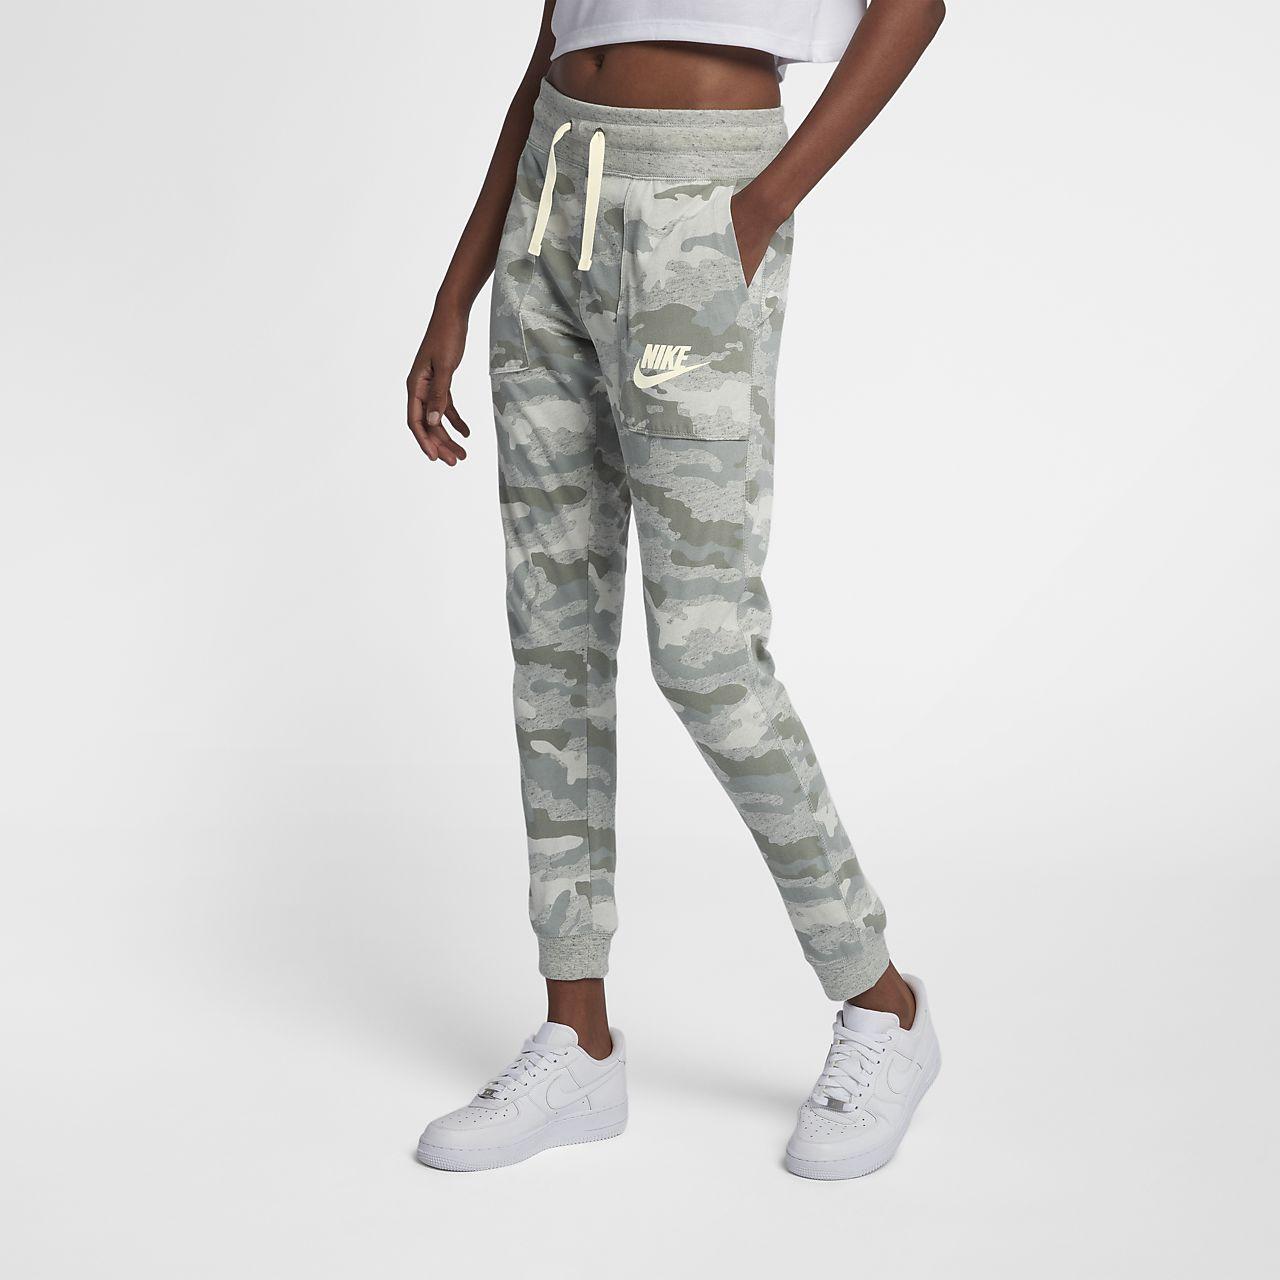 ... Pantalon camouflage Nike Sportswear Gym Vintage pour Femme